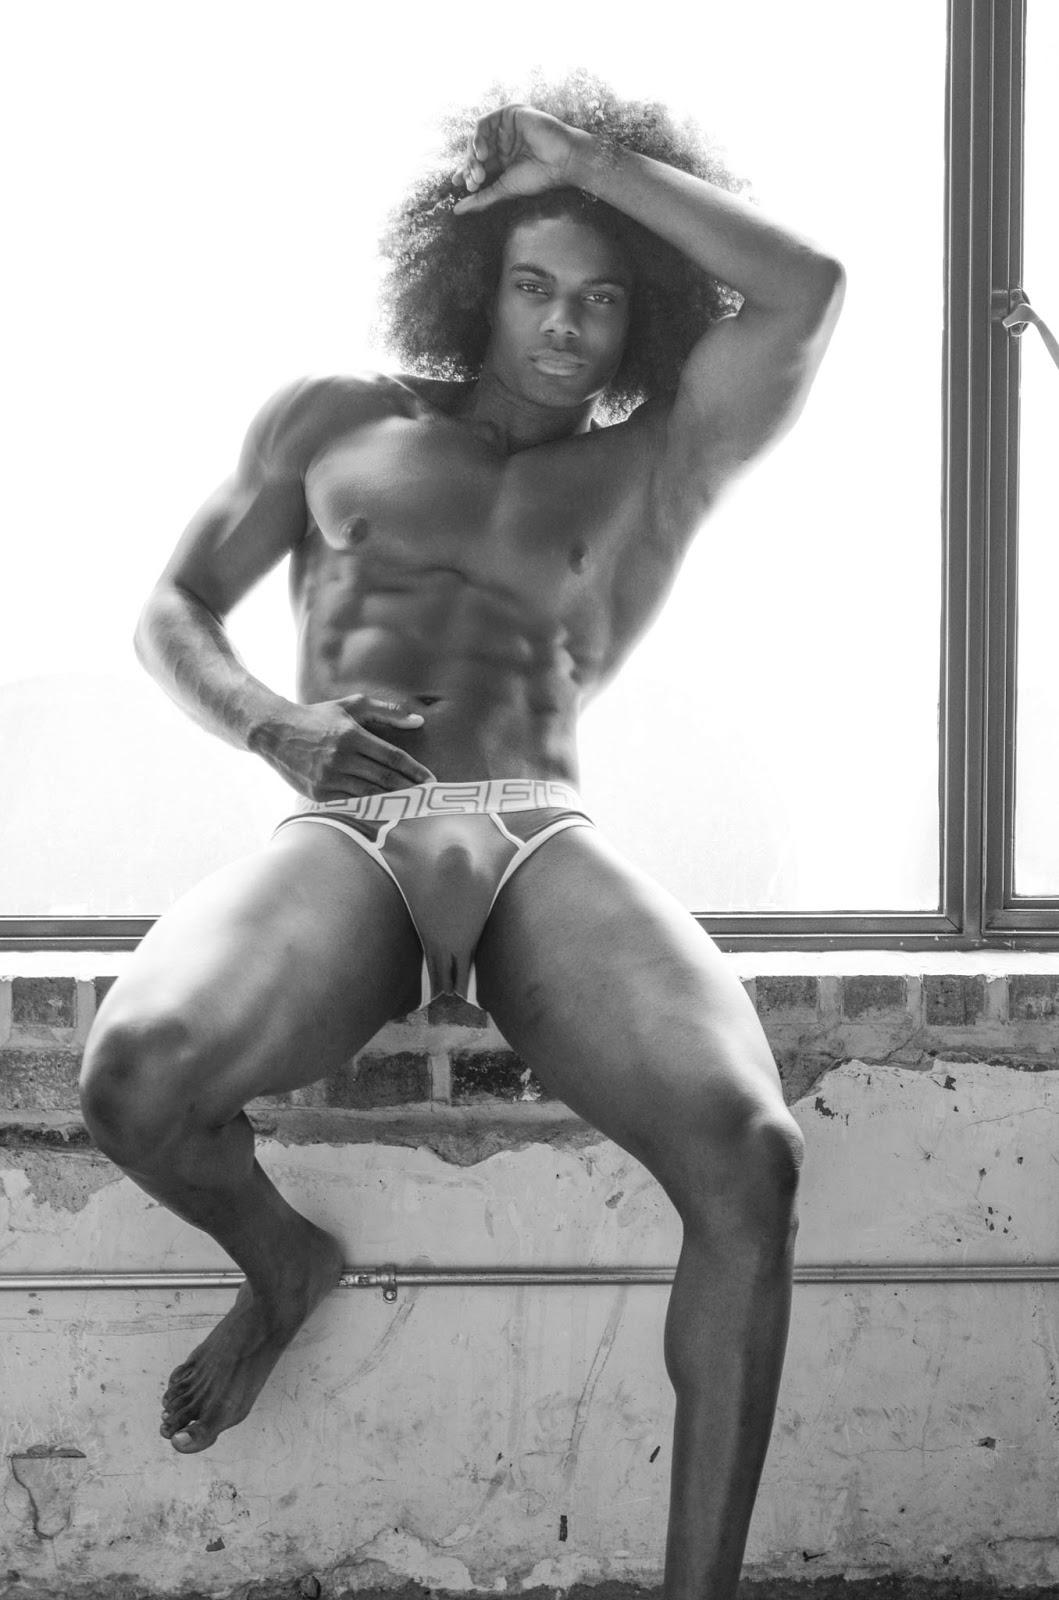 Raw Rods Bareback Black Sex Videos Big Dicks Fucking Tight Ass Raw No Condom Cream Filled Ass Holes And Blatino Muscle Guys Fucking